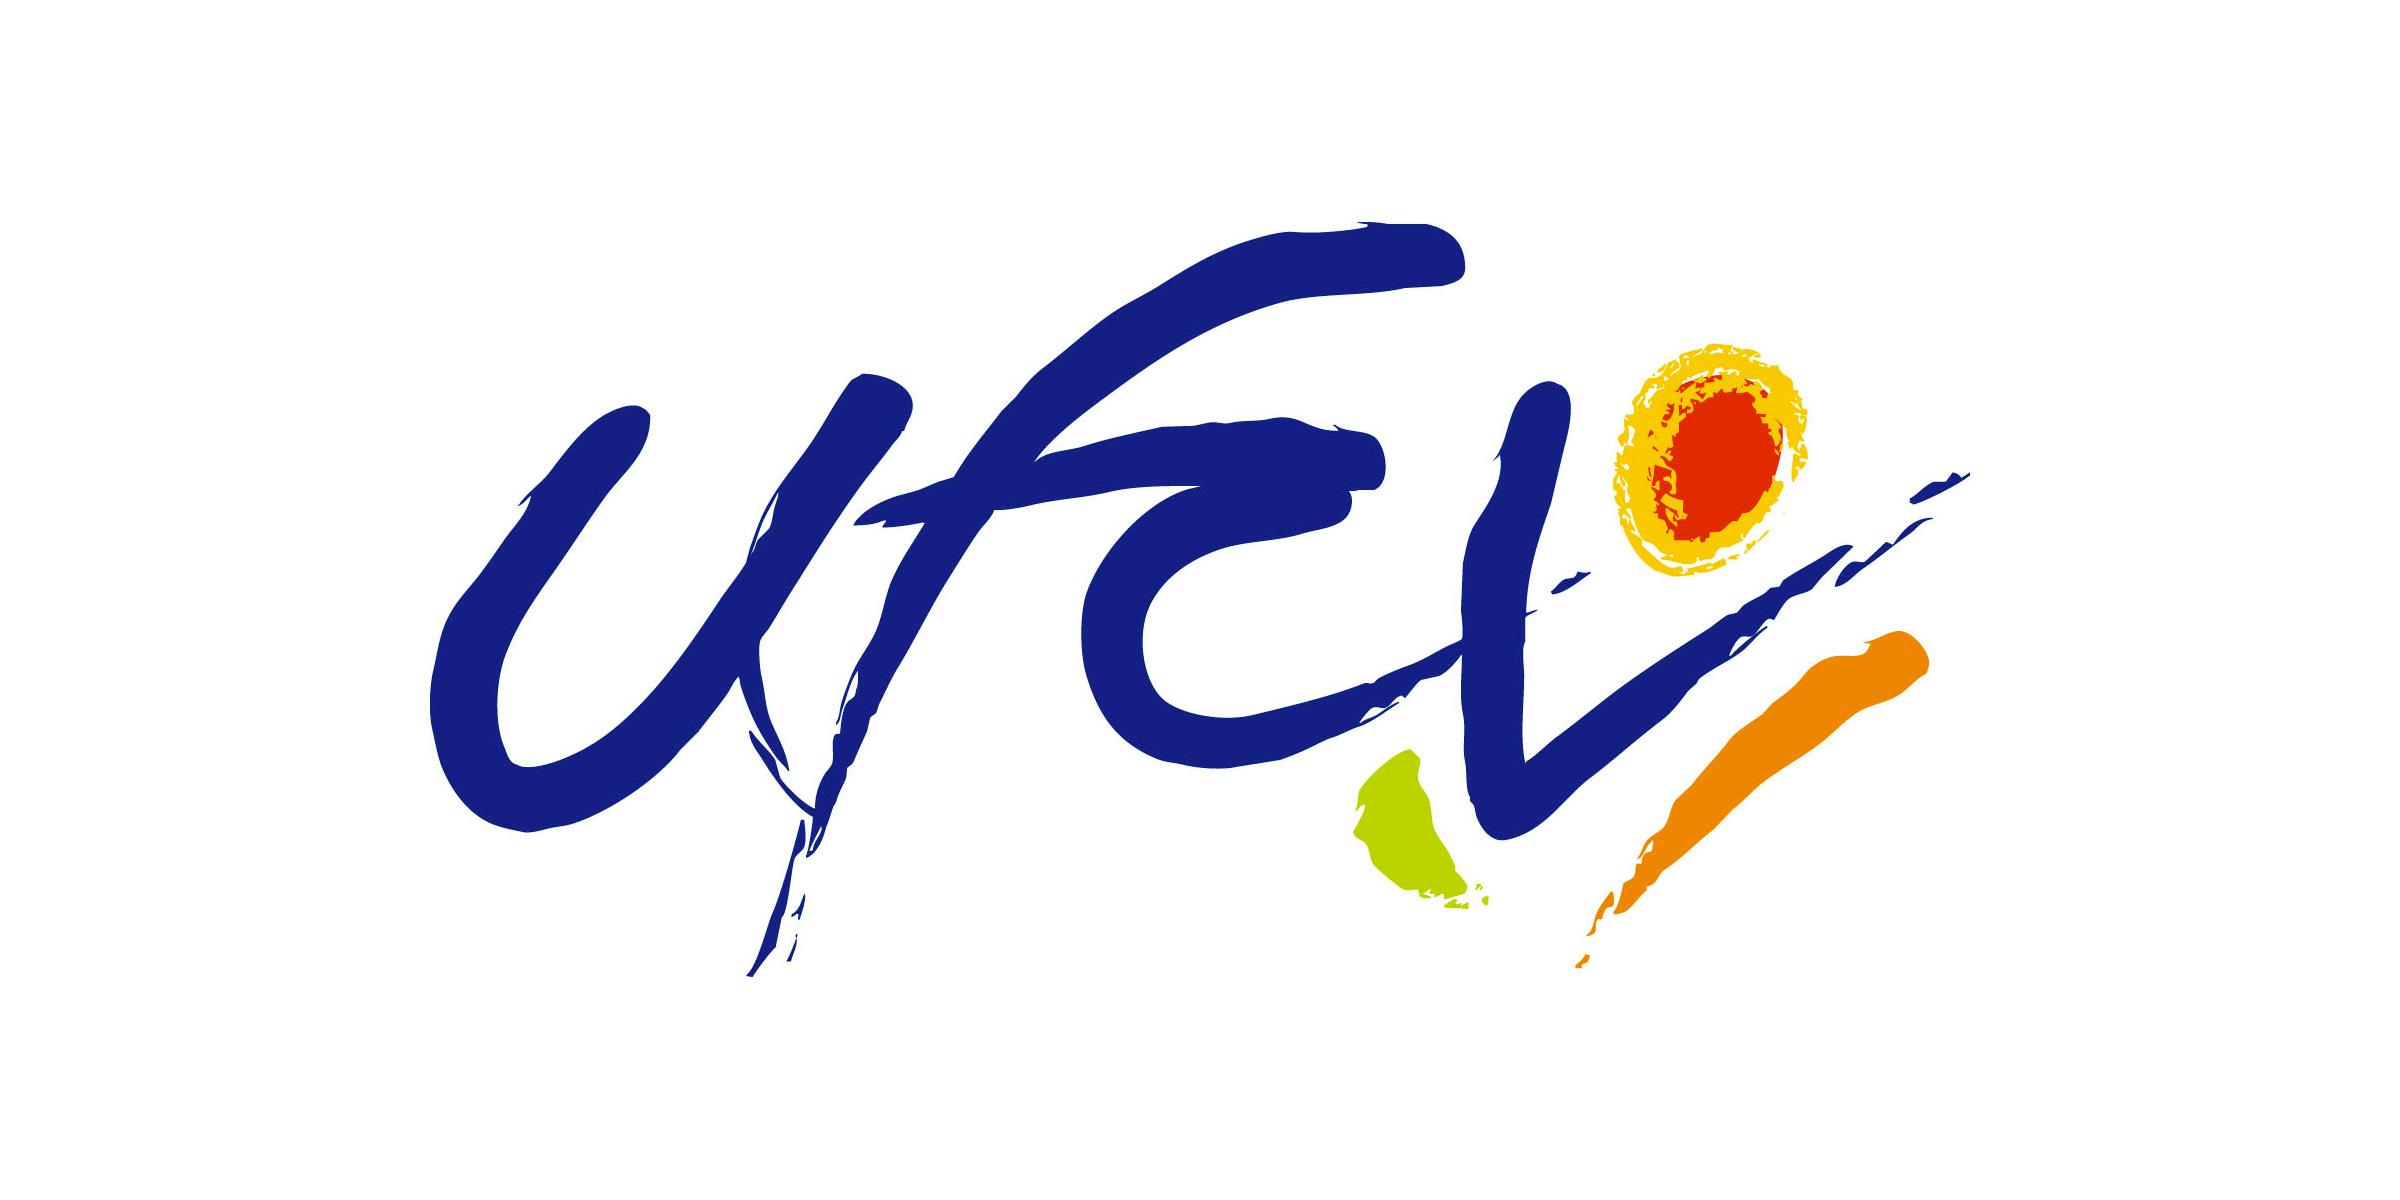 AJRVS (Association de la Jeunesse Rurale de la Vallée de la Saye)